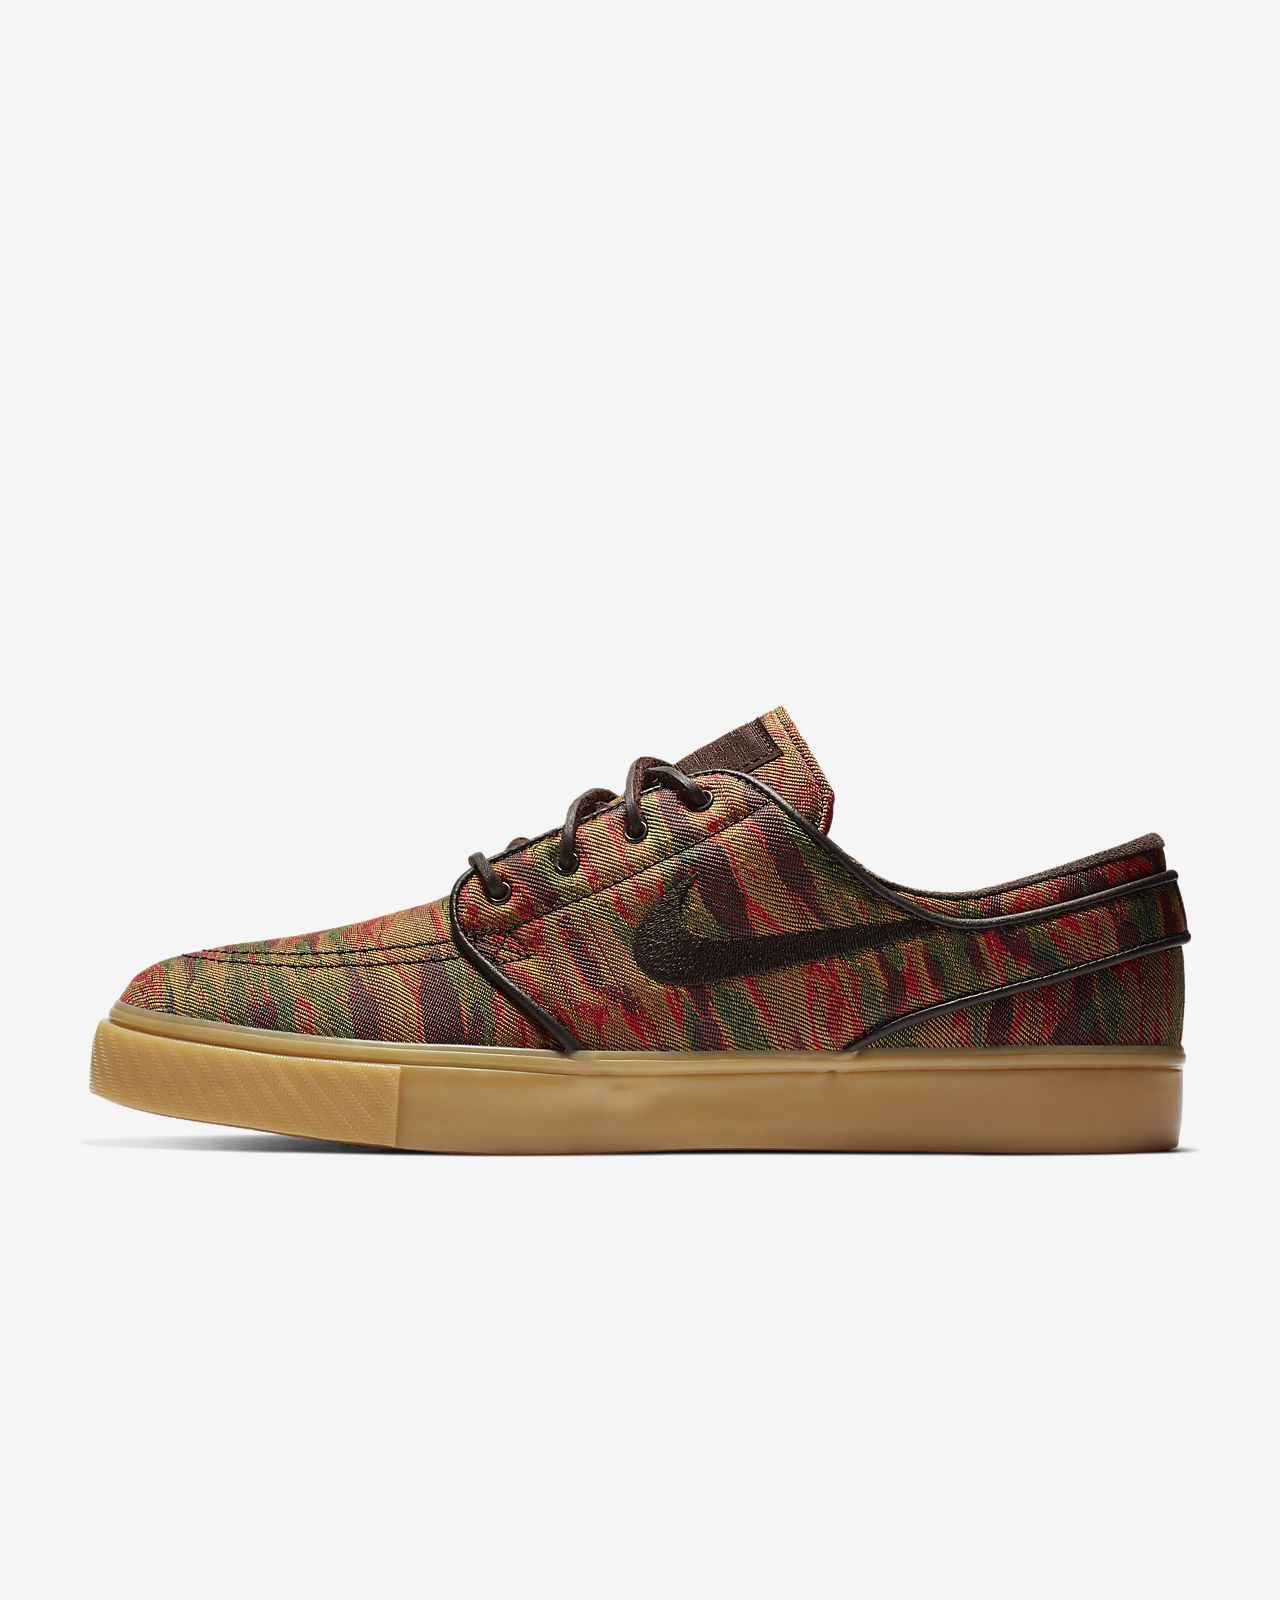 7e8a9cb65be ... Sapatilhas de skateboard Nike SB Zoom Stefan Janoski Canvas Premium  para homem